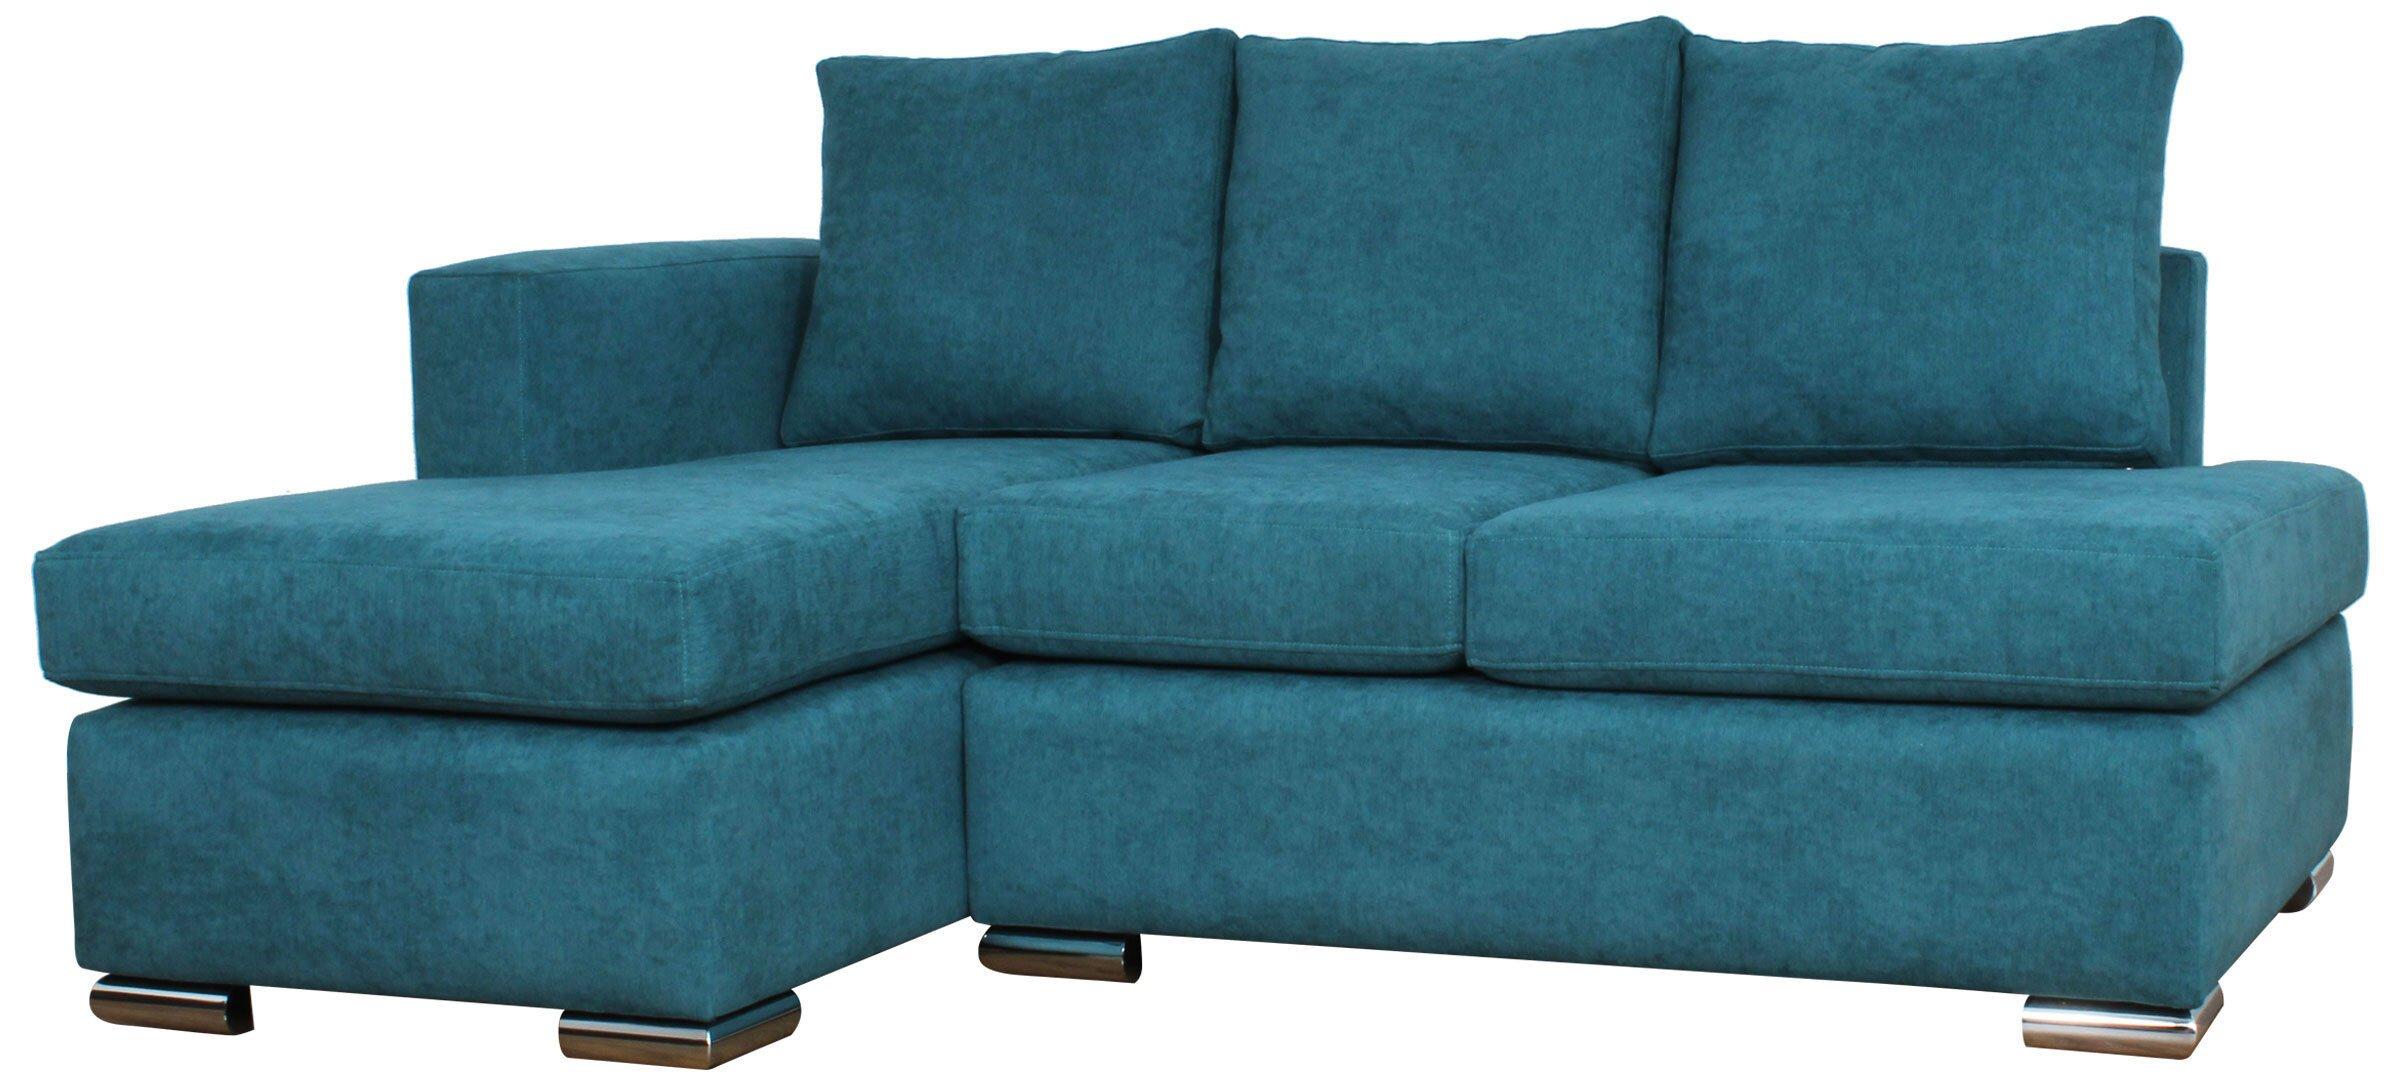 Sofa Modular Iz Mecha Pata Metalica22